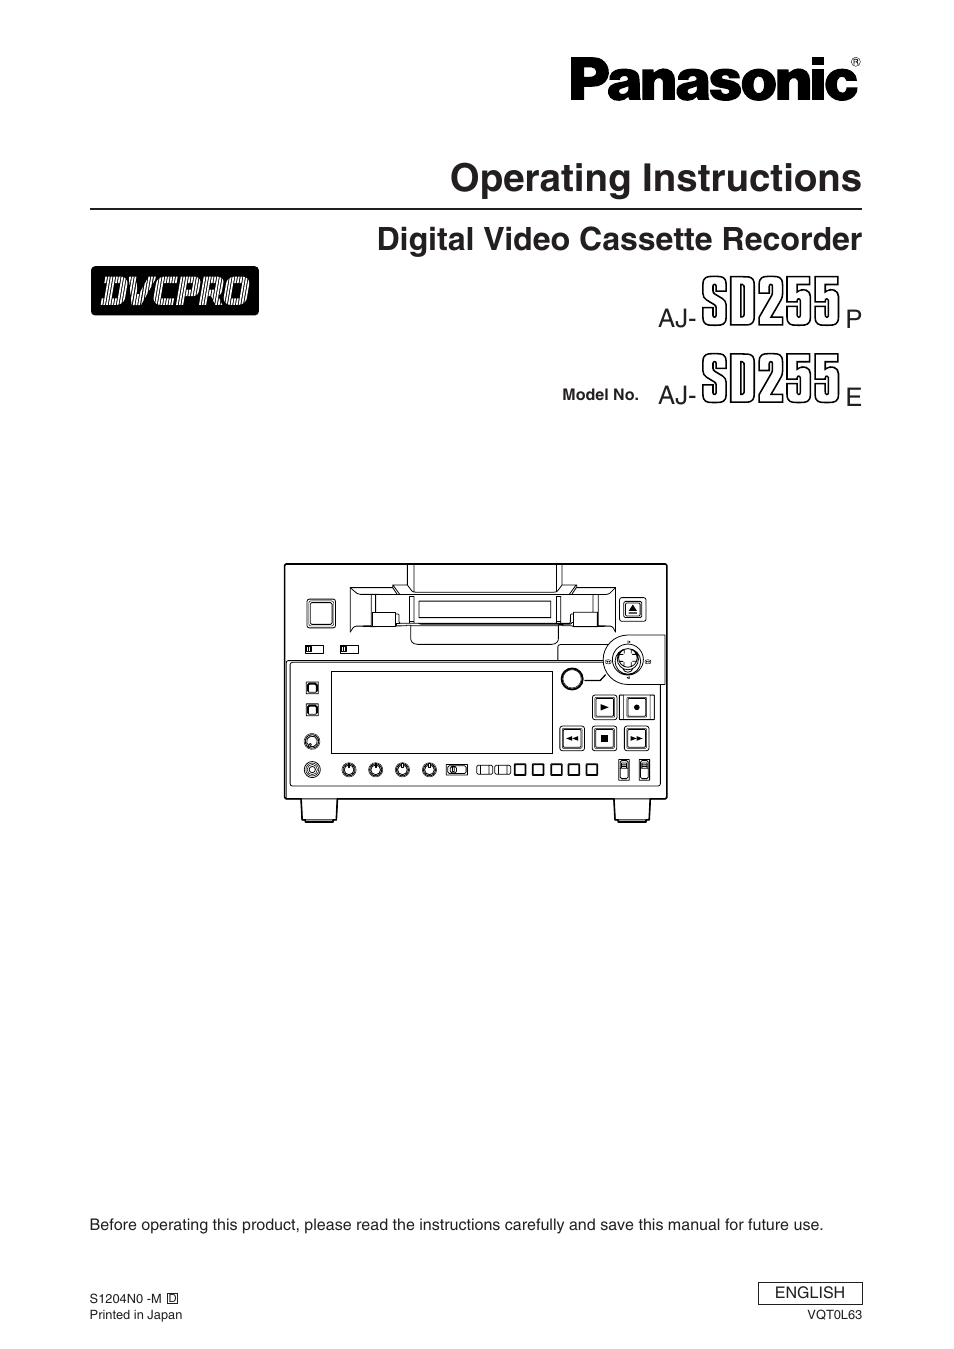 panasonic aj sd255 user manual 46 pages rh manualsdir com panasonic sd 255 user manual Panasonic Cordless Phones